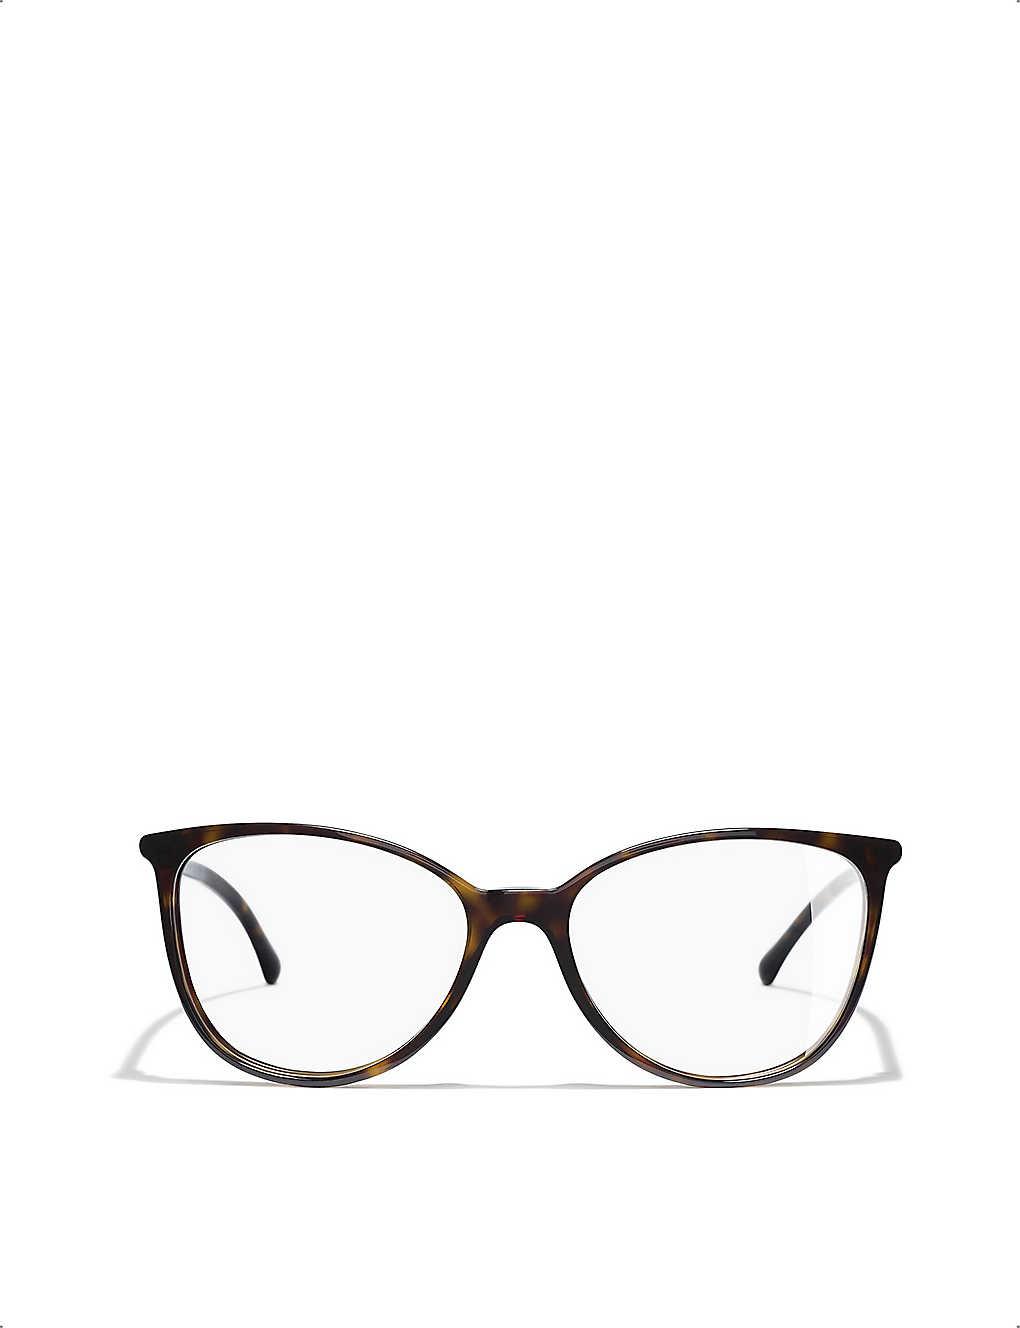 e0c79ee8a5 CHANEL - CH3373 tortoiseshell-effect cat-eye glasses